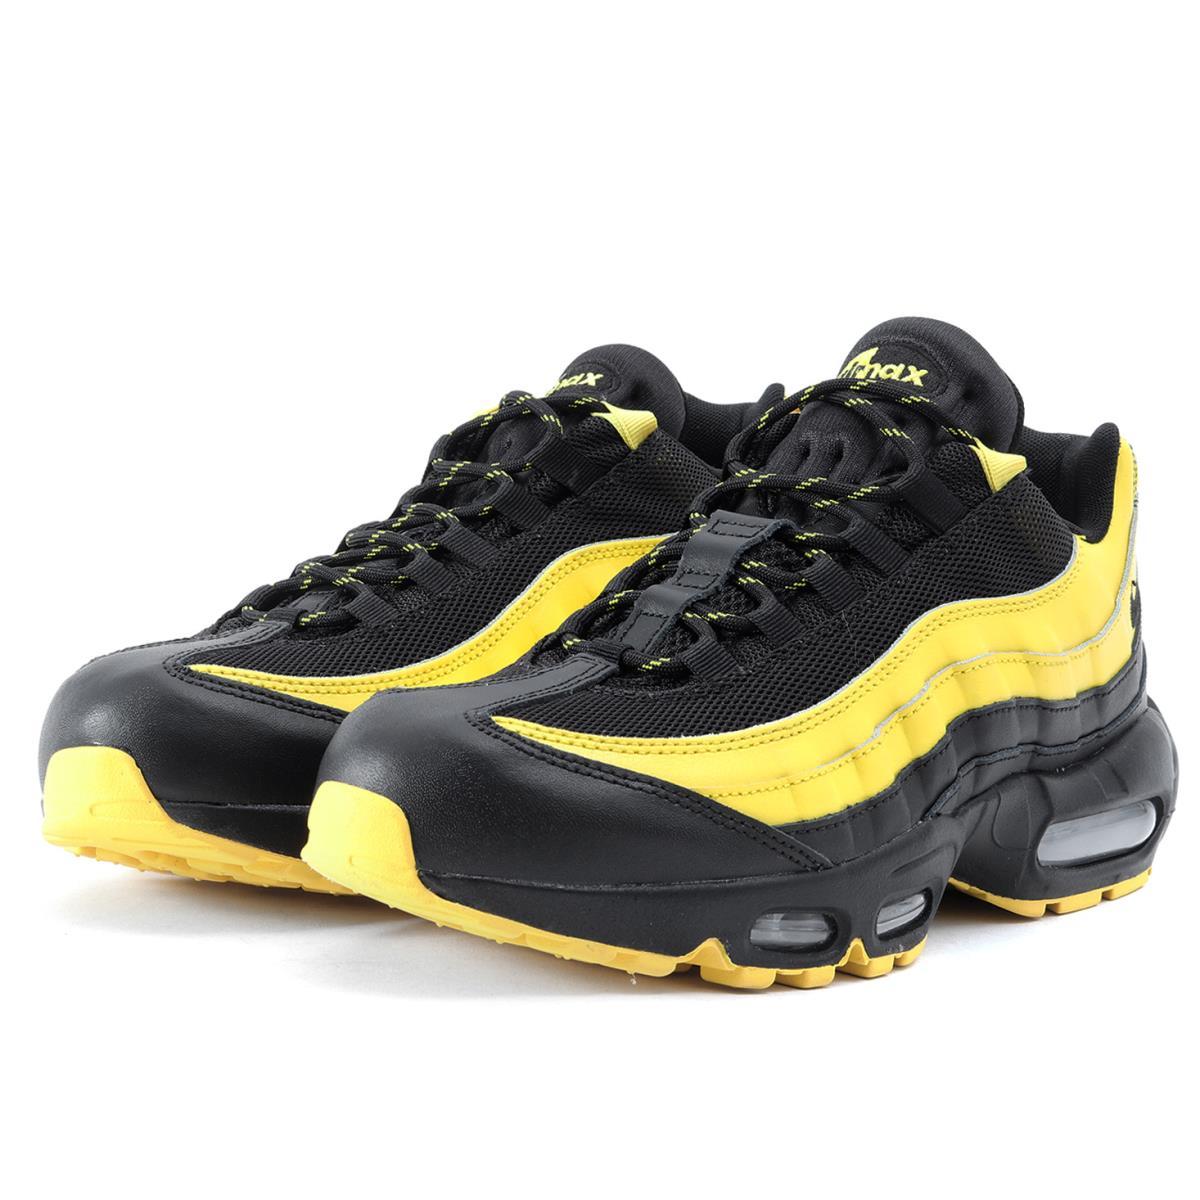 wholesale dealer acfcc 114b7 NIKE (Nike) FOOT LOCKER comment AIR MAX 95 FREQUENCY PACK(AV7939-001) black  X yellow US9(27cm)